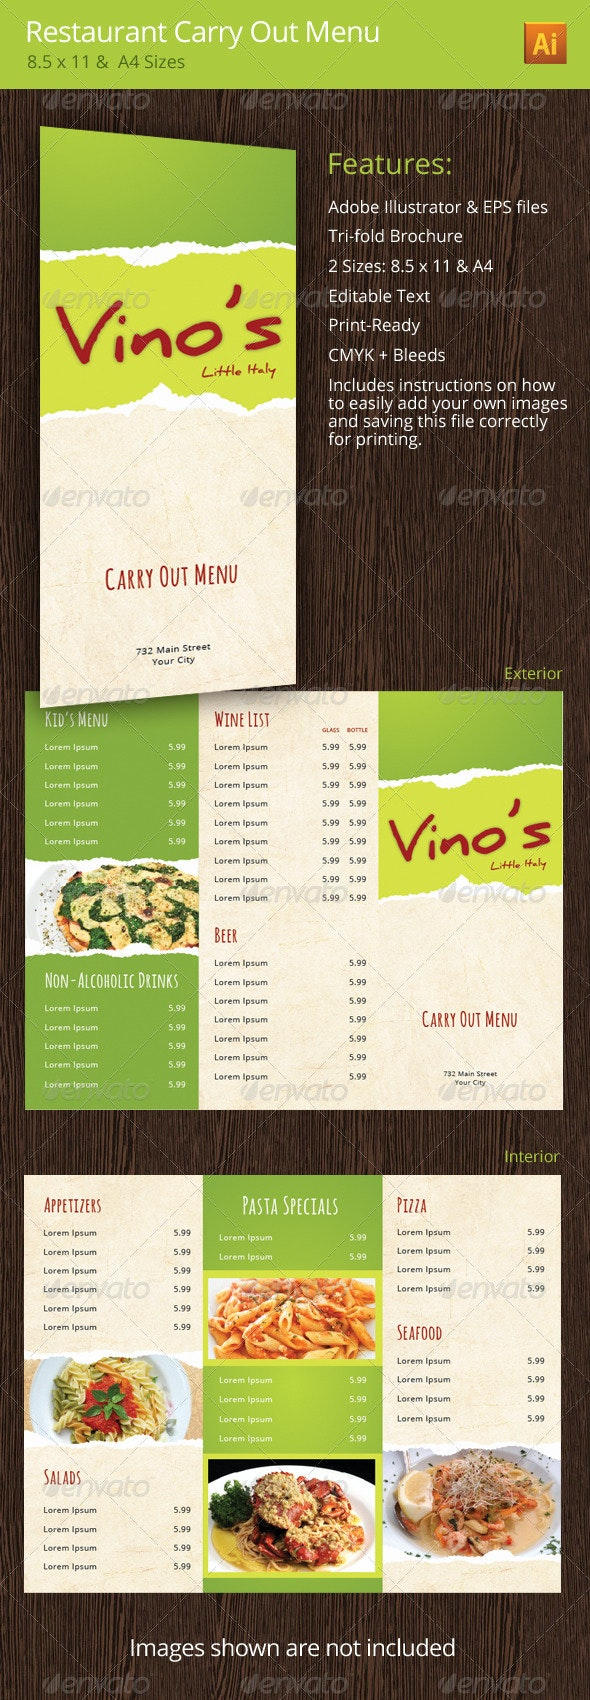 Italian Restaurant Rustic Carry Out Menu - Food Menus Print Templates